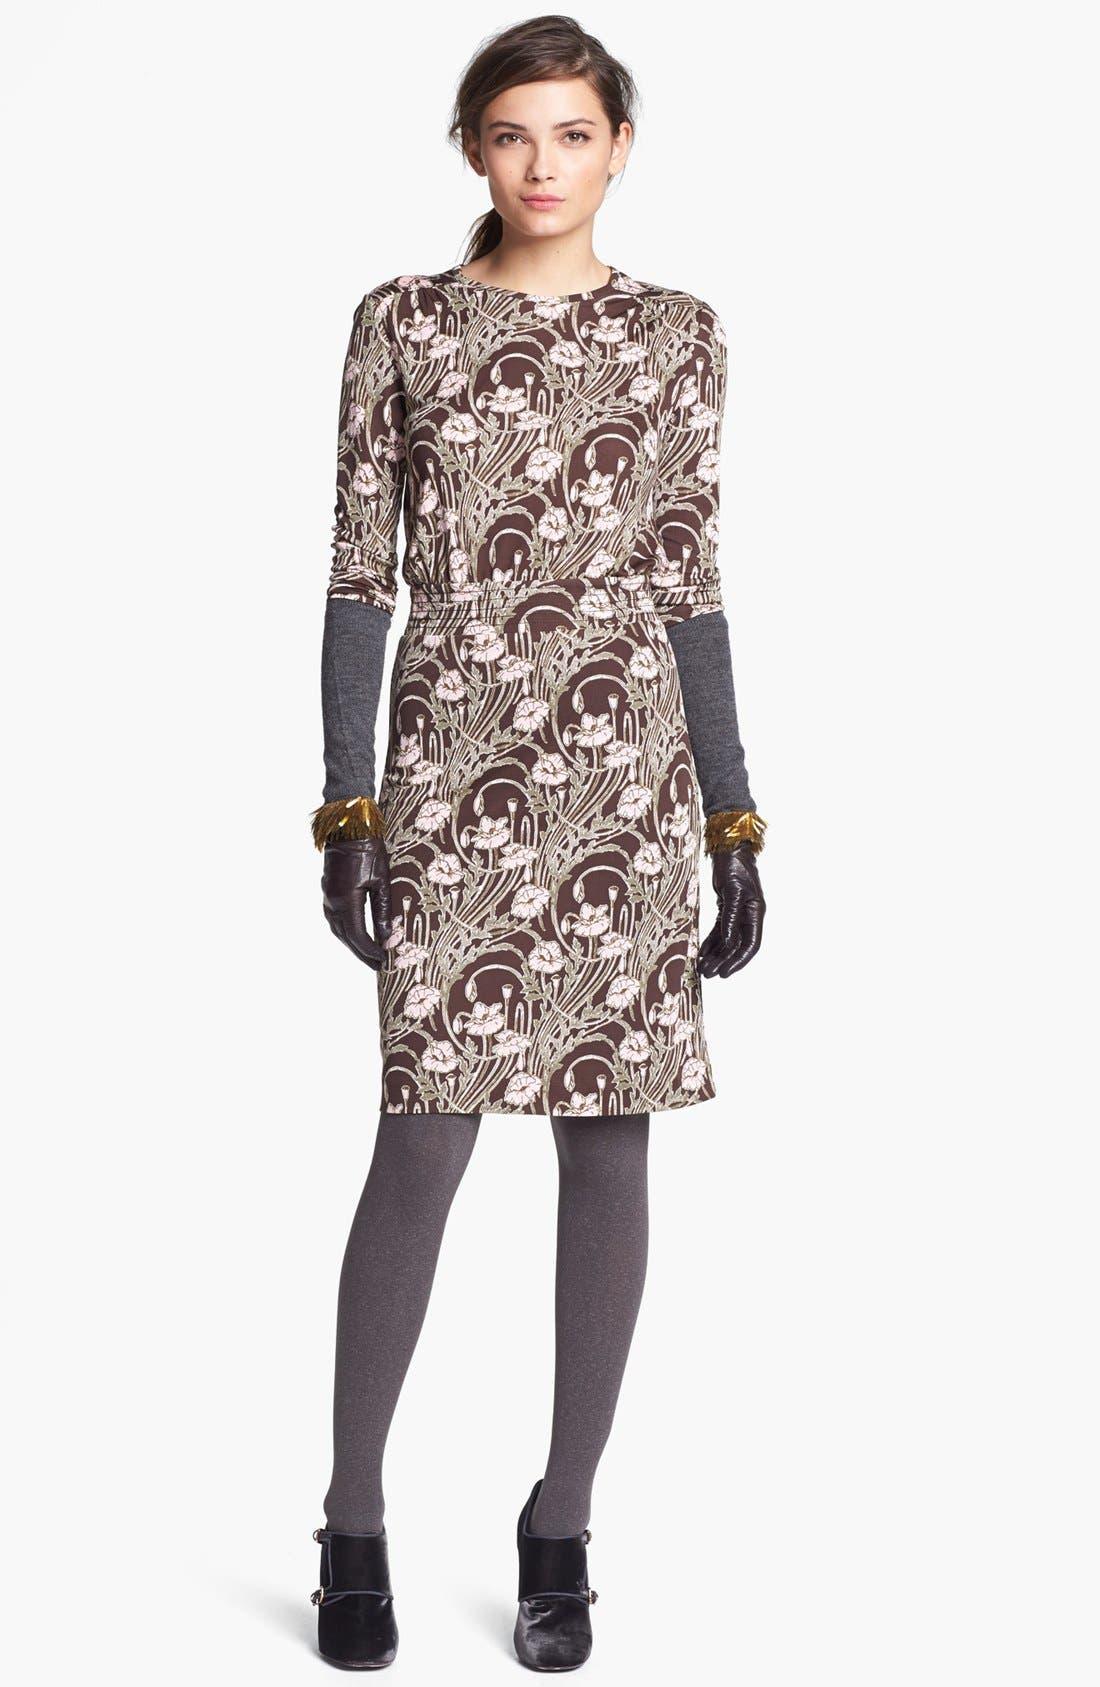 Main Image - Tory Burch Dress & Pump